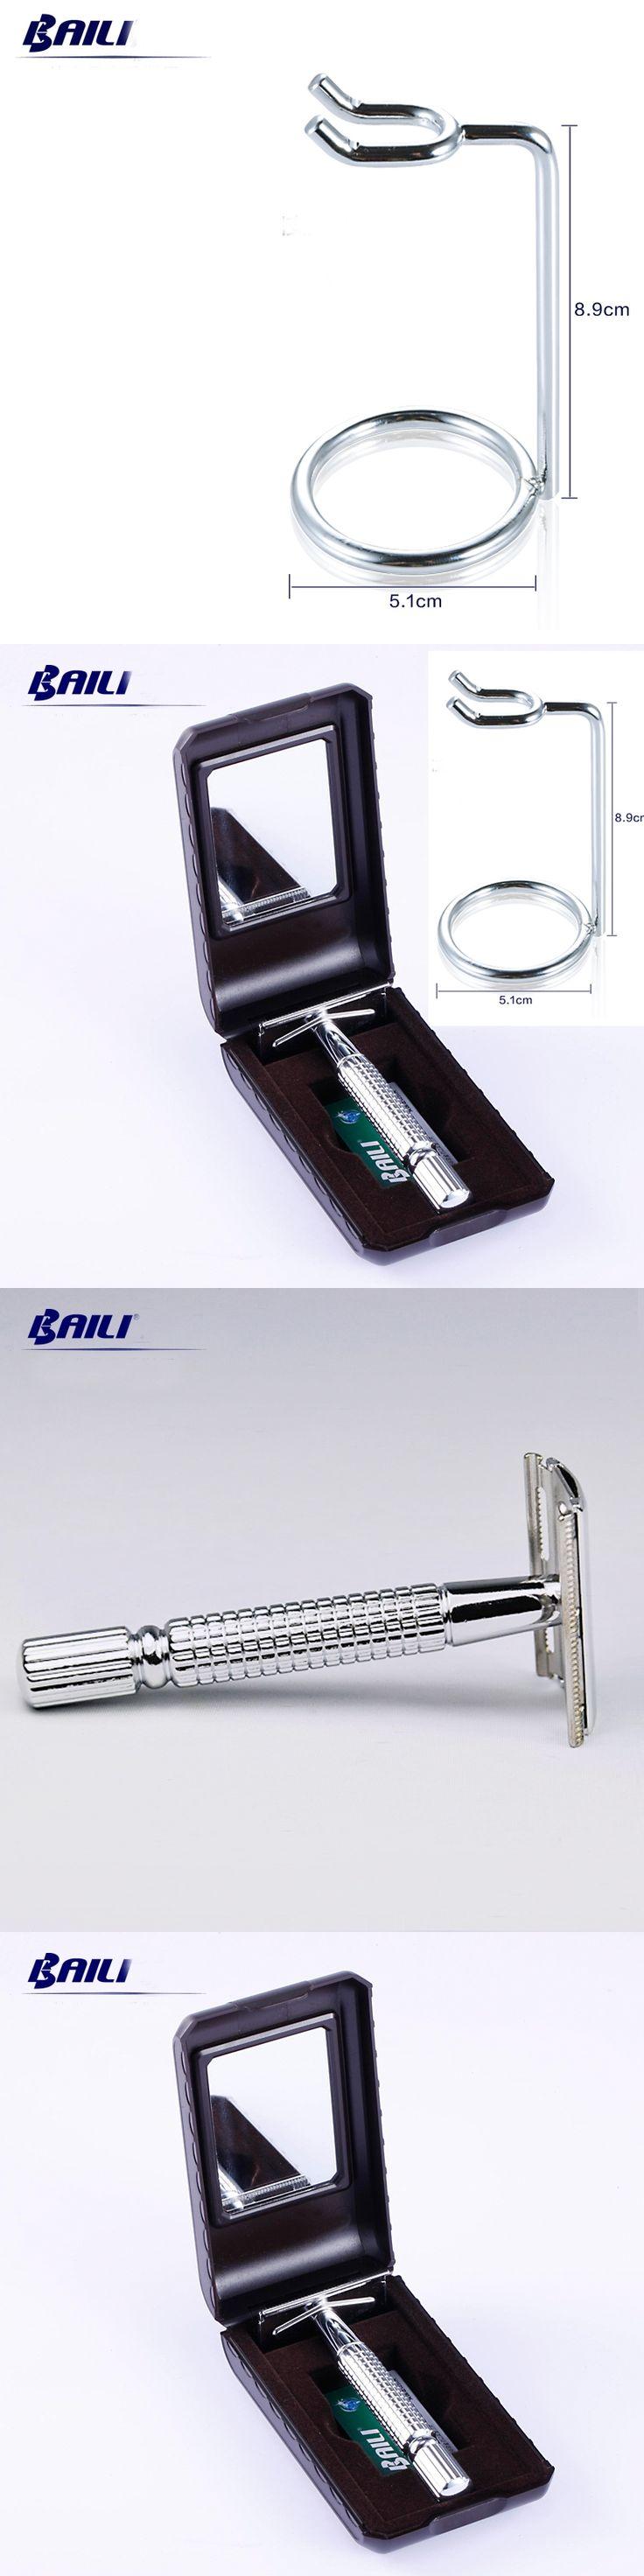 1 Safety Razor +1 Stand + 30 Pcs Blades Men Shaving Set Manual Shaver Kit For Men Maquinillas De Afeitar